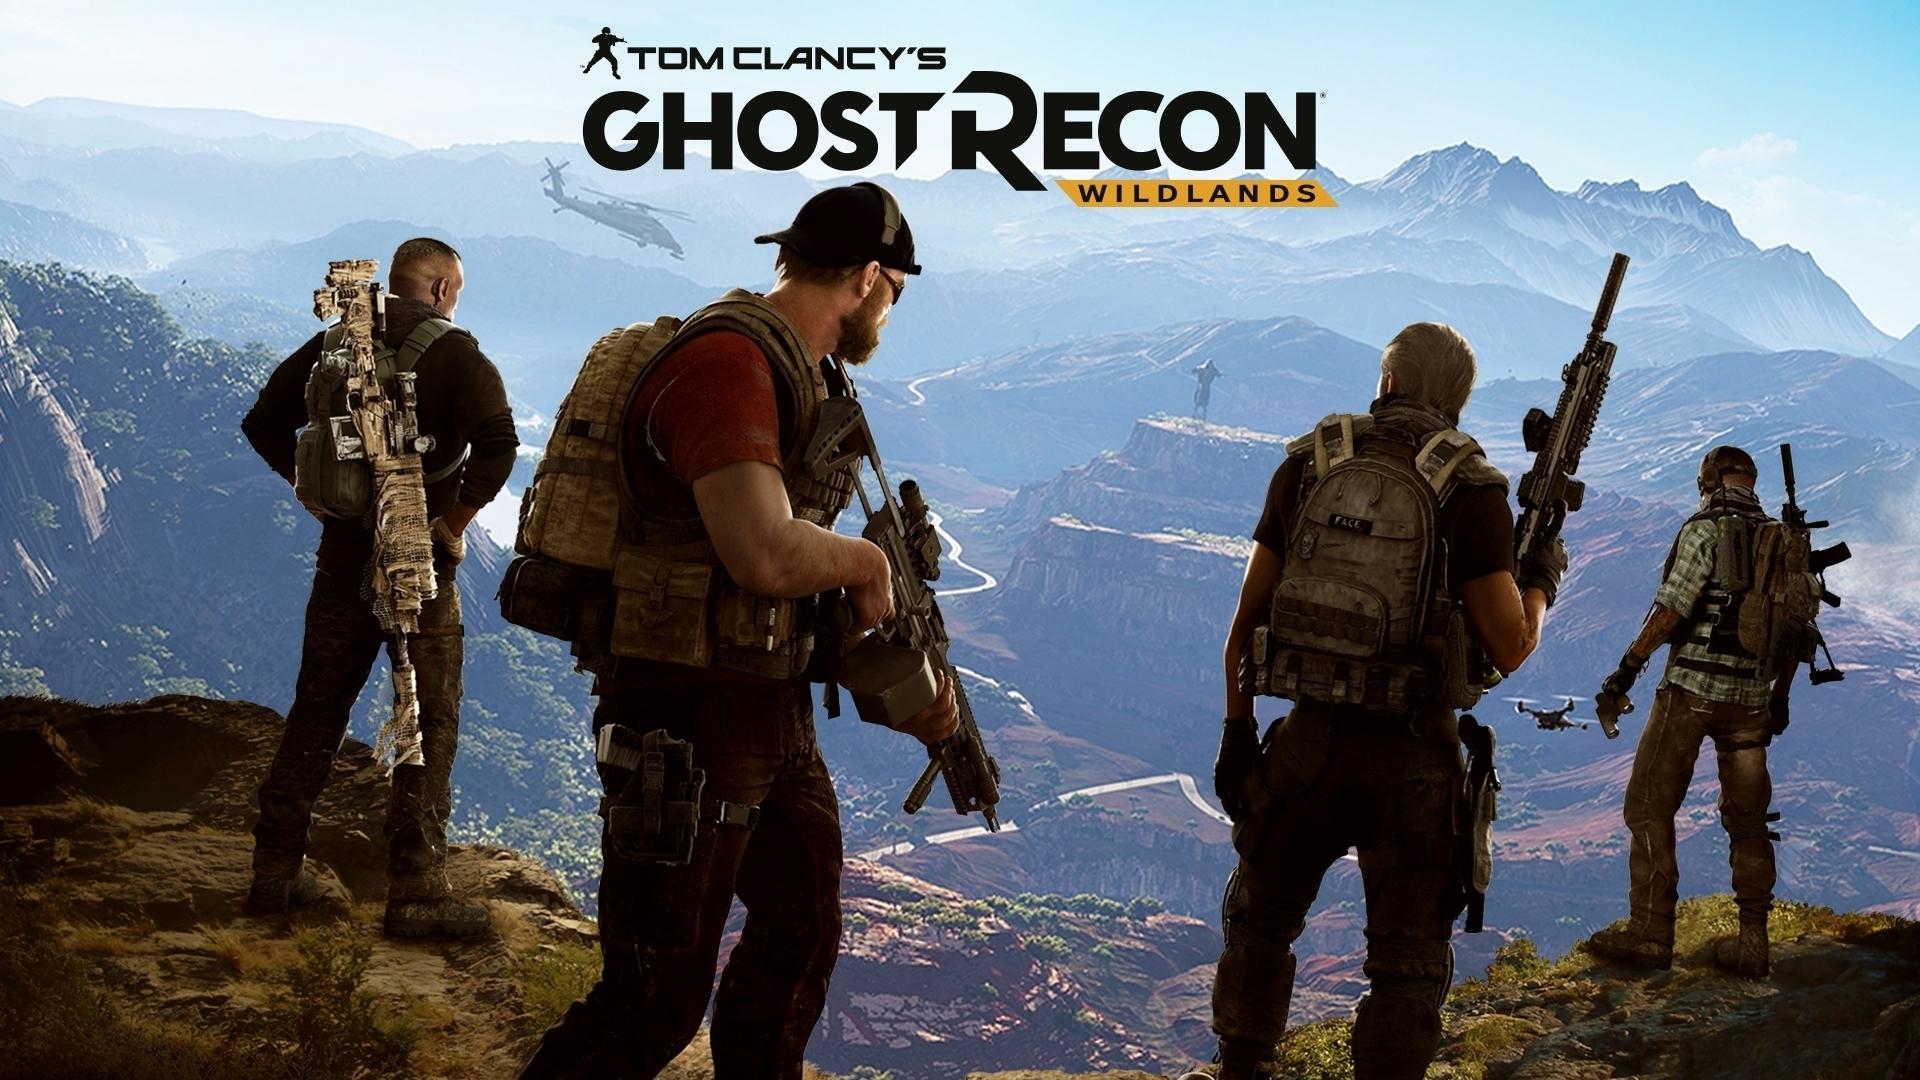 Ghost Recon Wildlands Hd Wallpaper